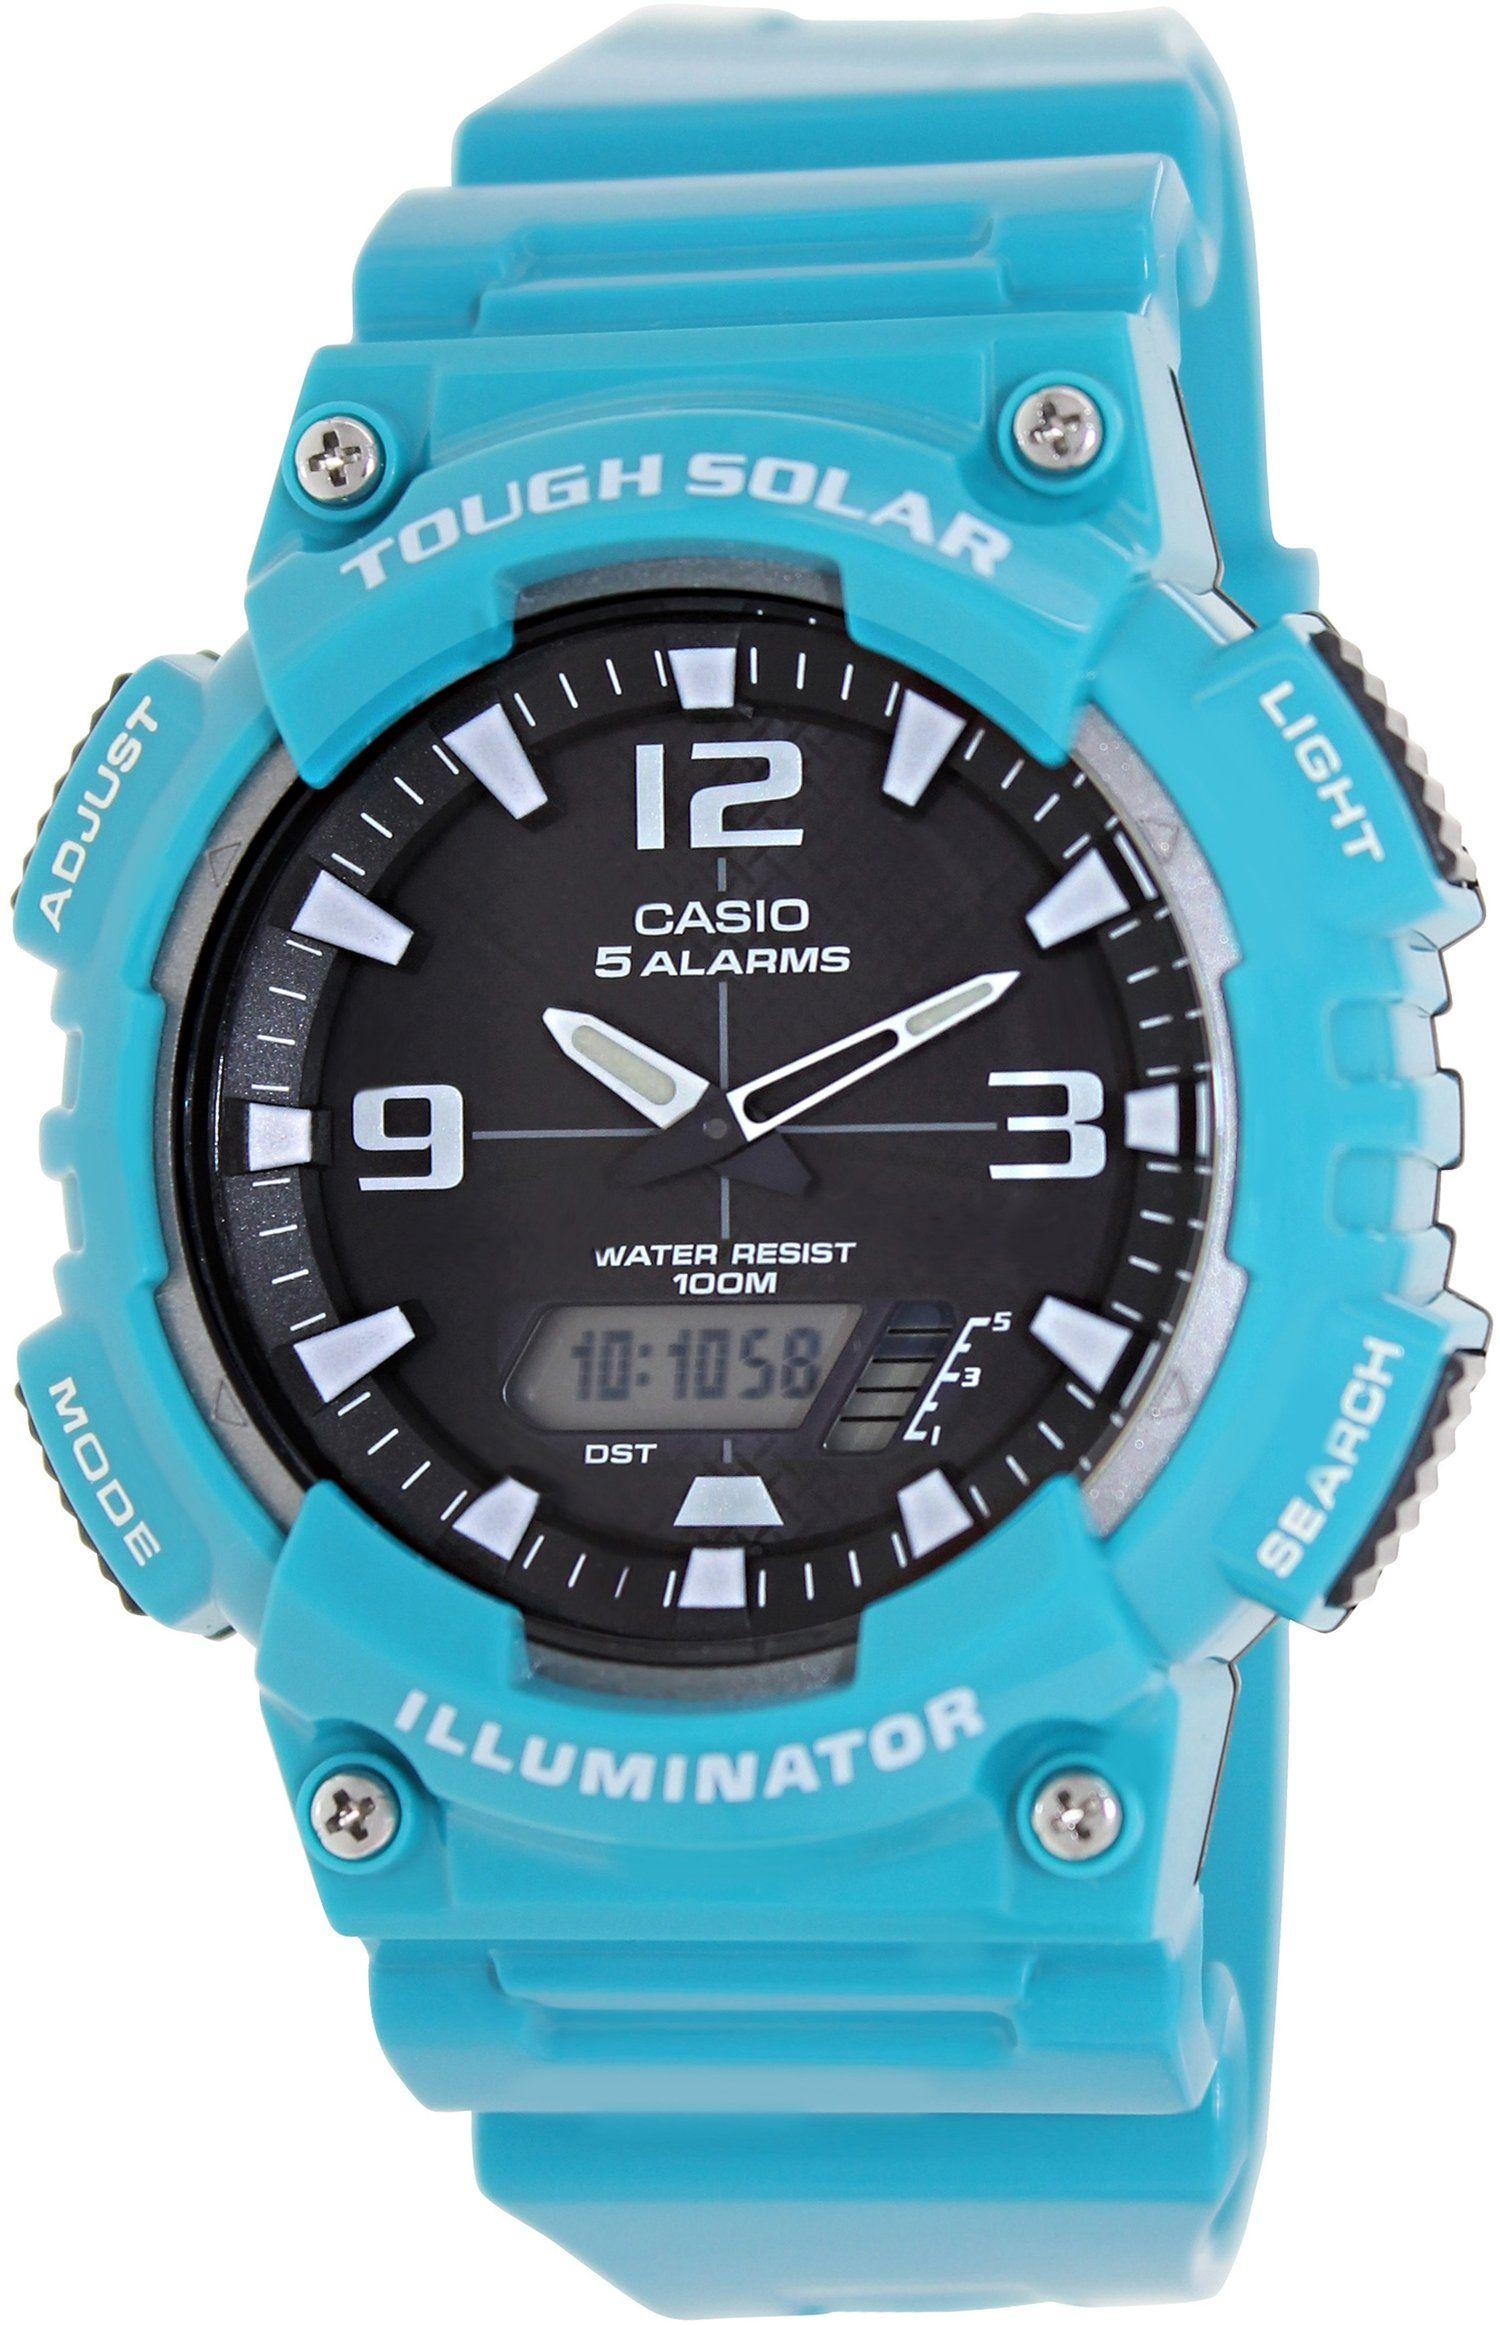 Amazon.com: Casio #AQ-S810WC-3AV Men's Teal Solar Analog Digital World Time Sports Watch: Casio: Watches